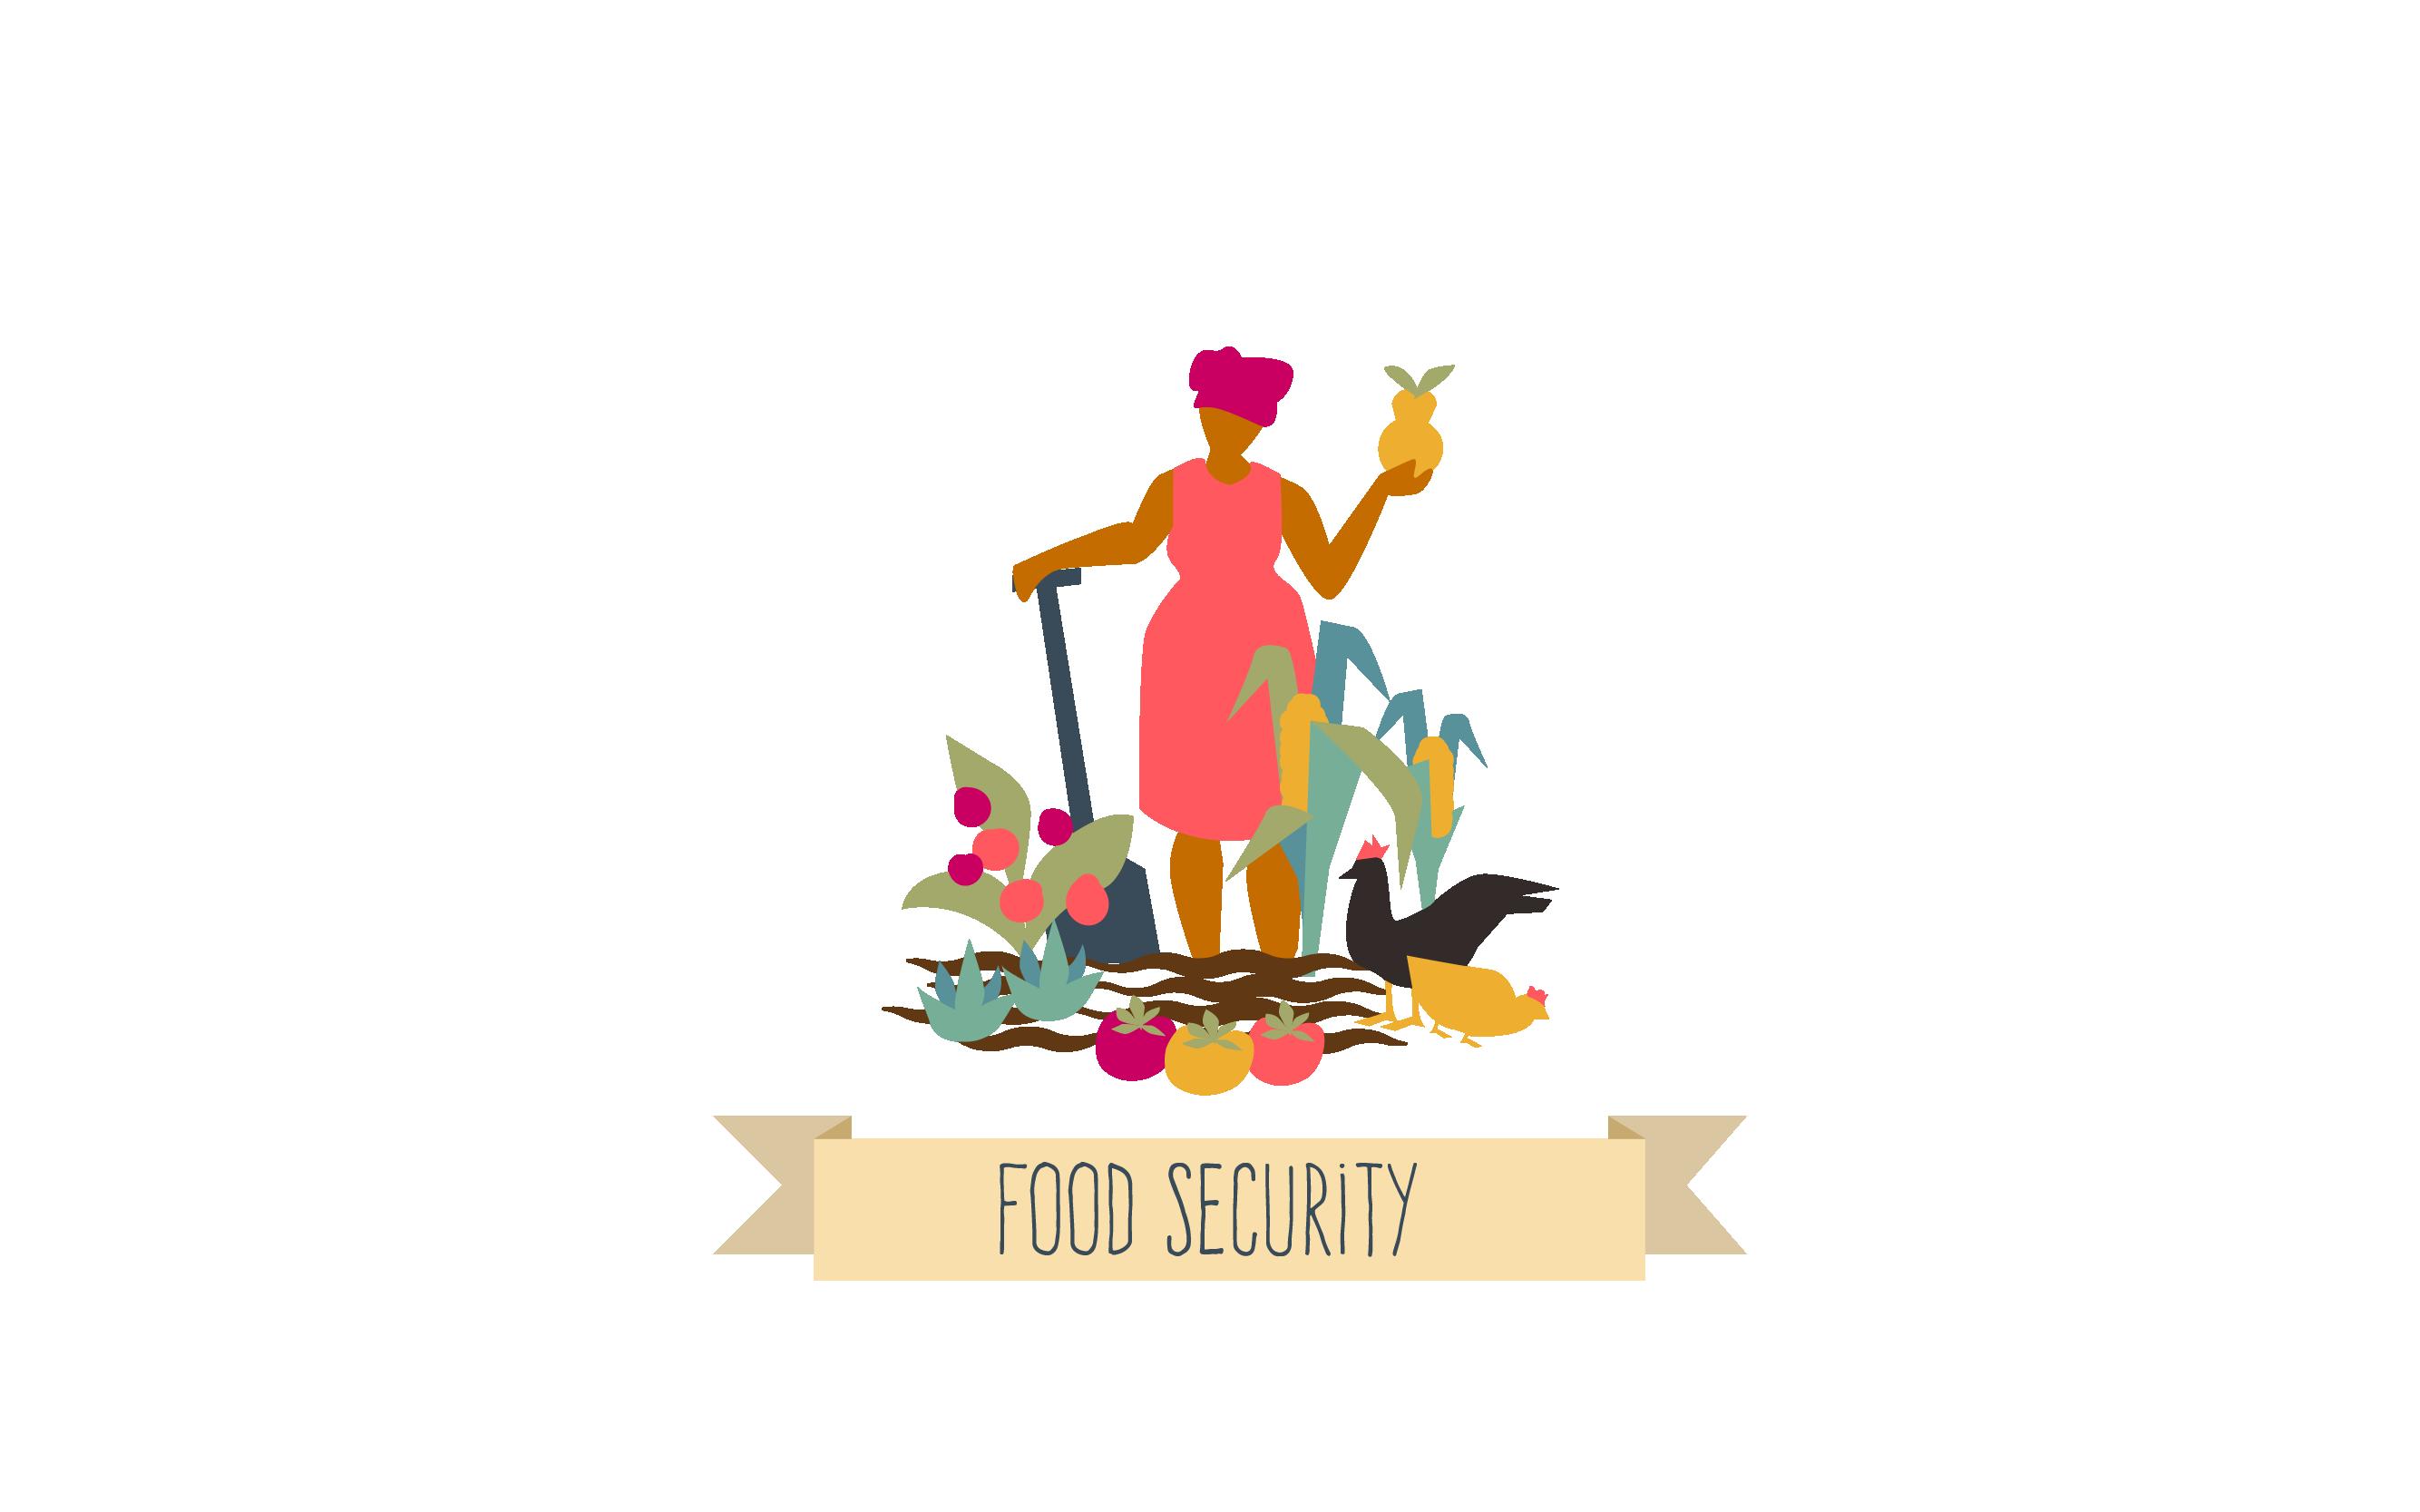 food security illustration